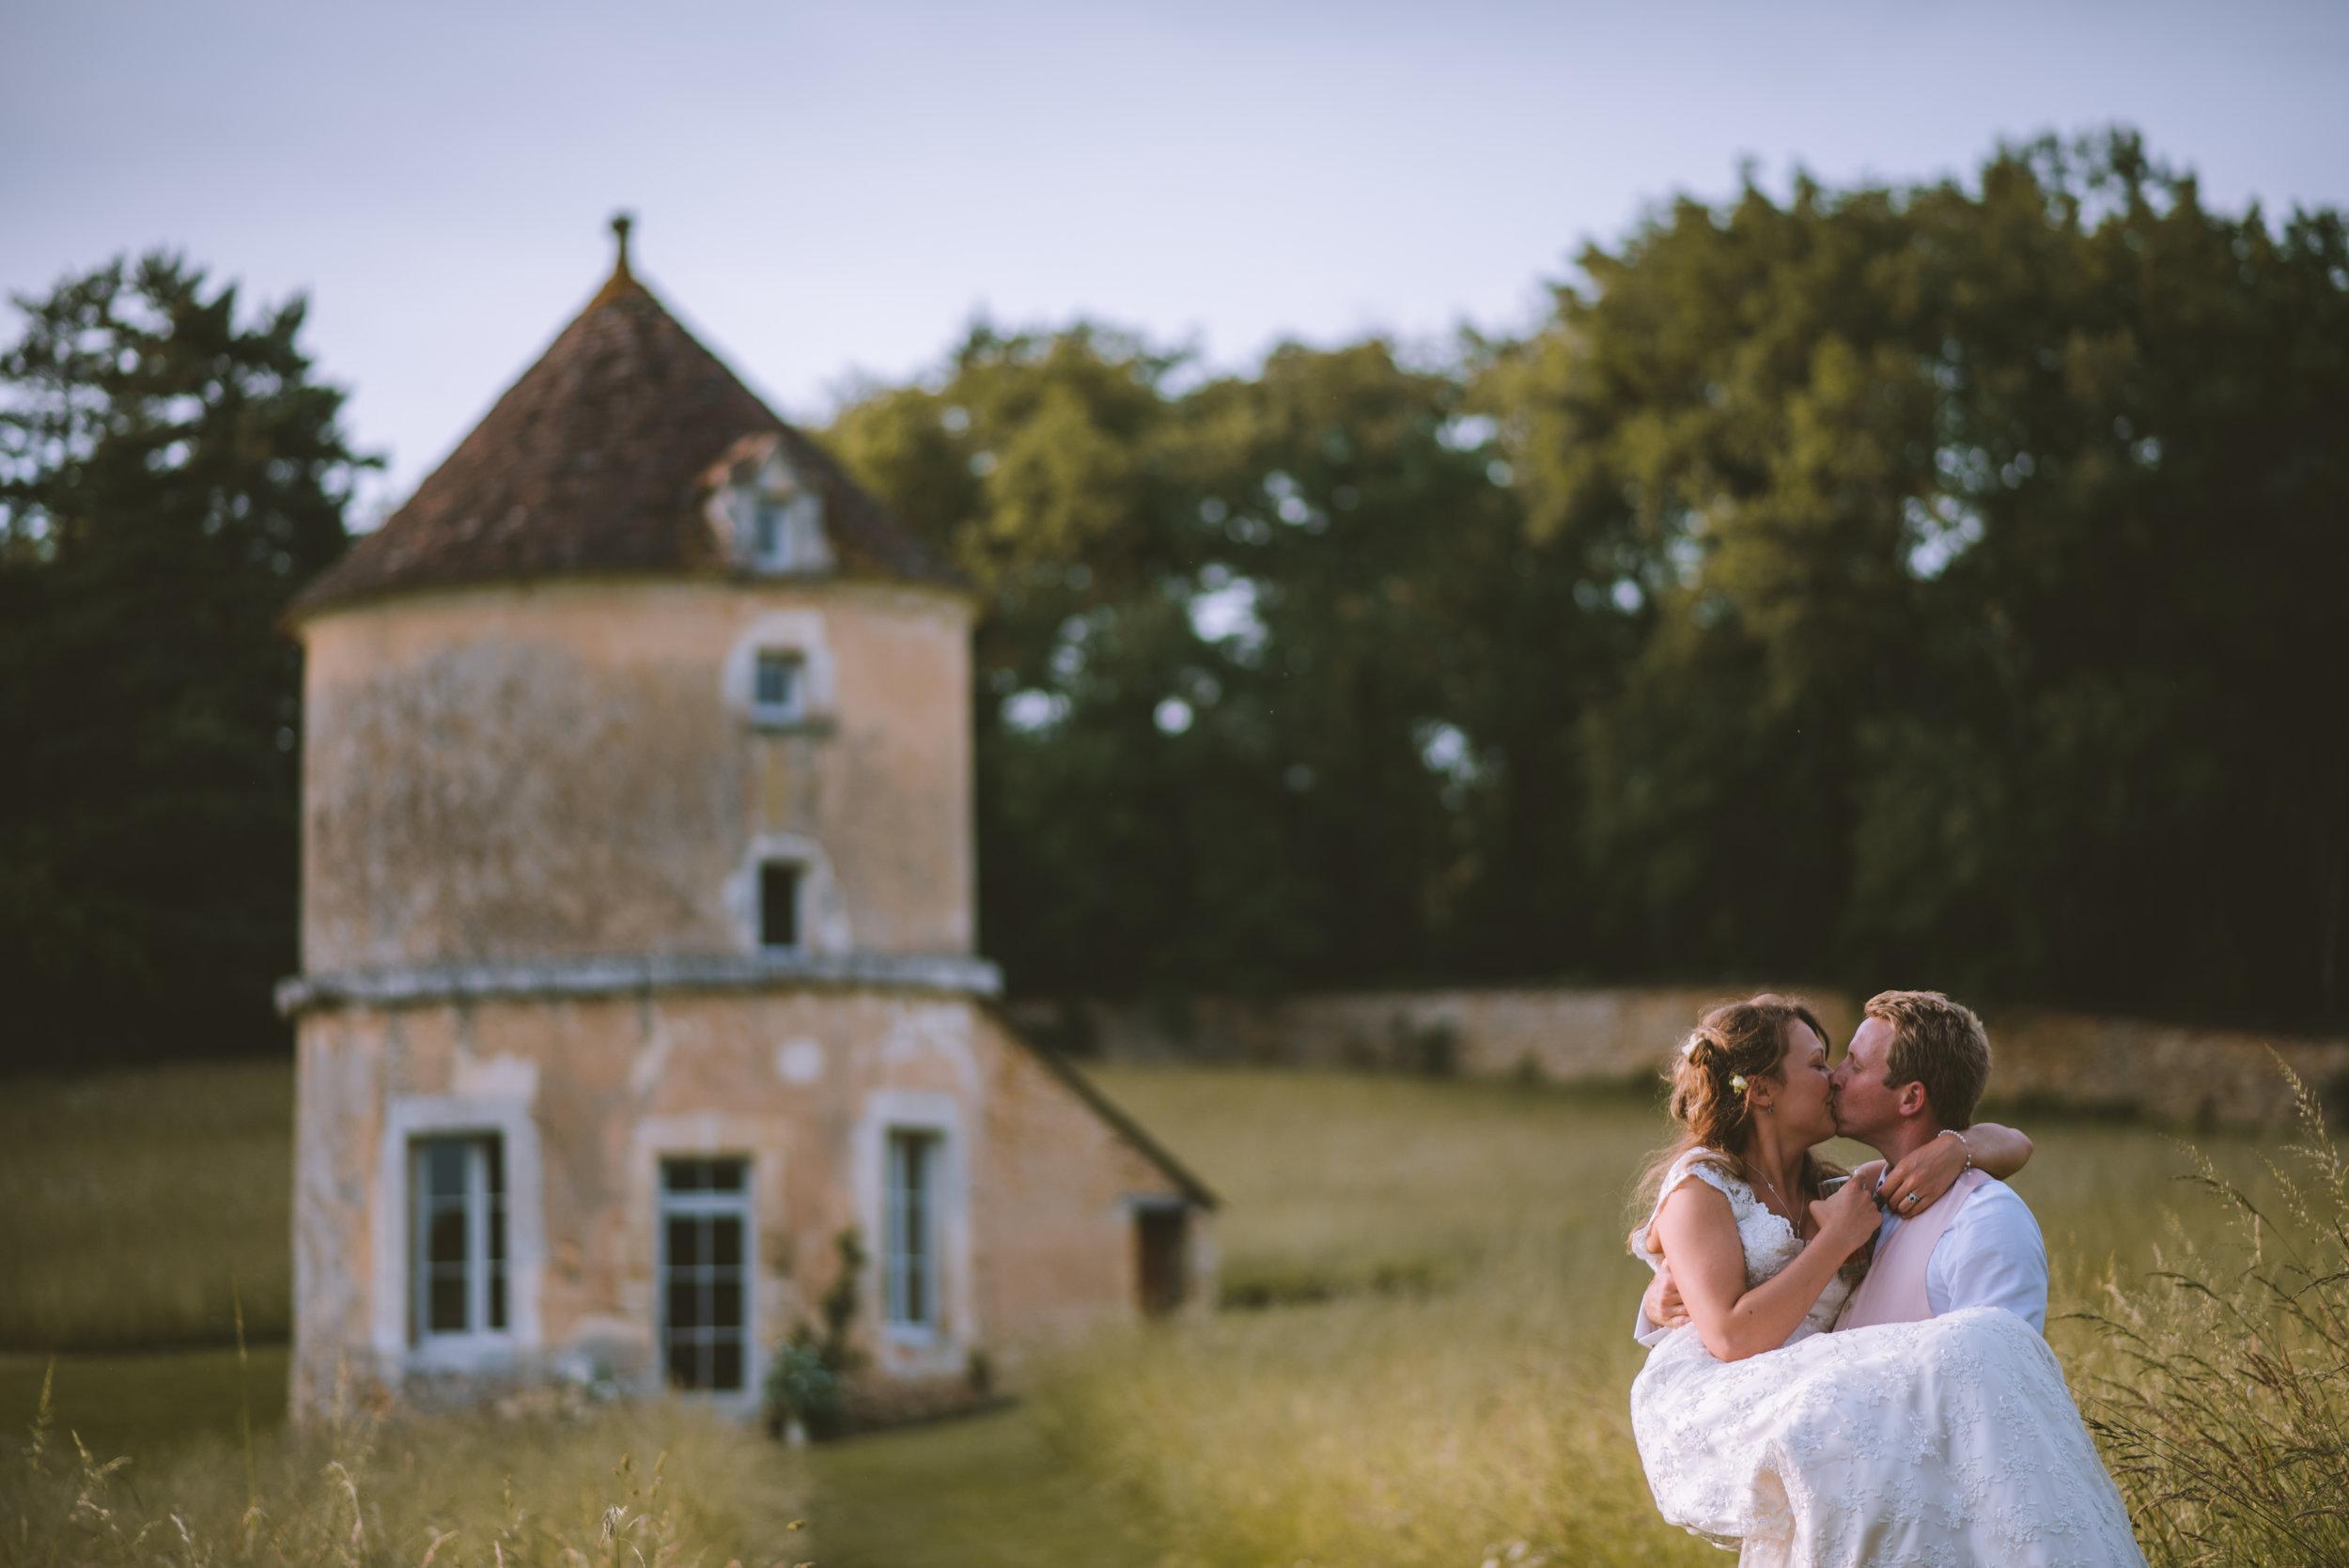 wedding-photographer-dordogne-mark-shaw-58.jpg